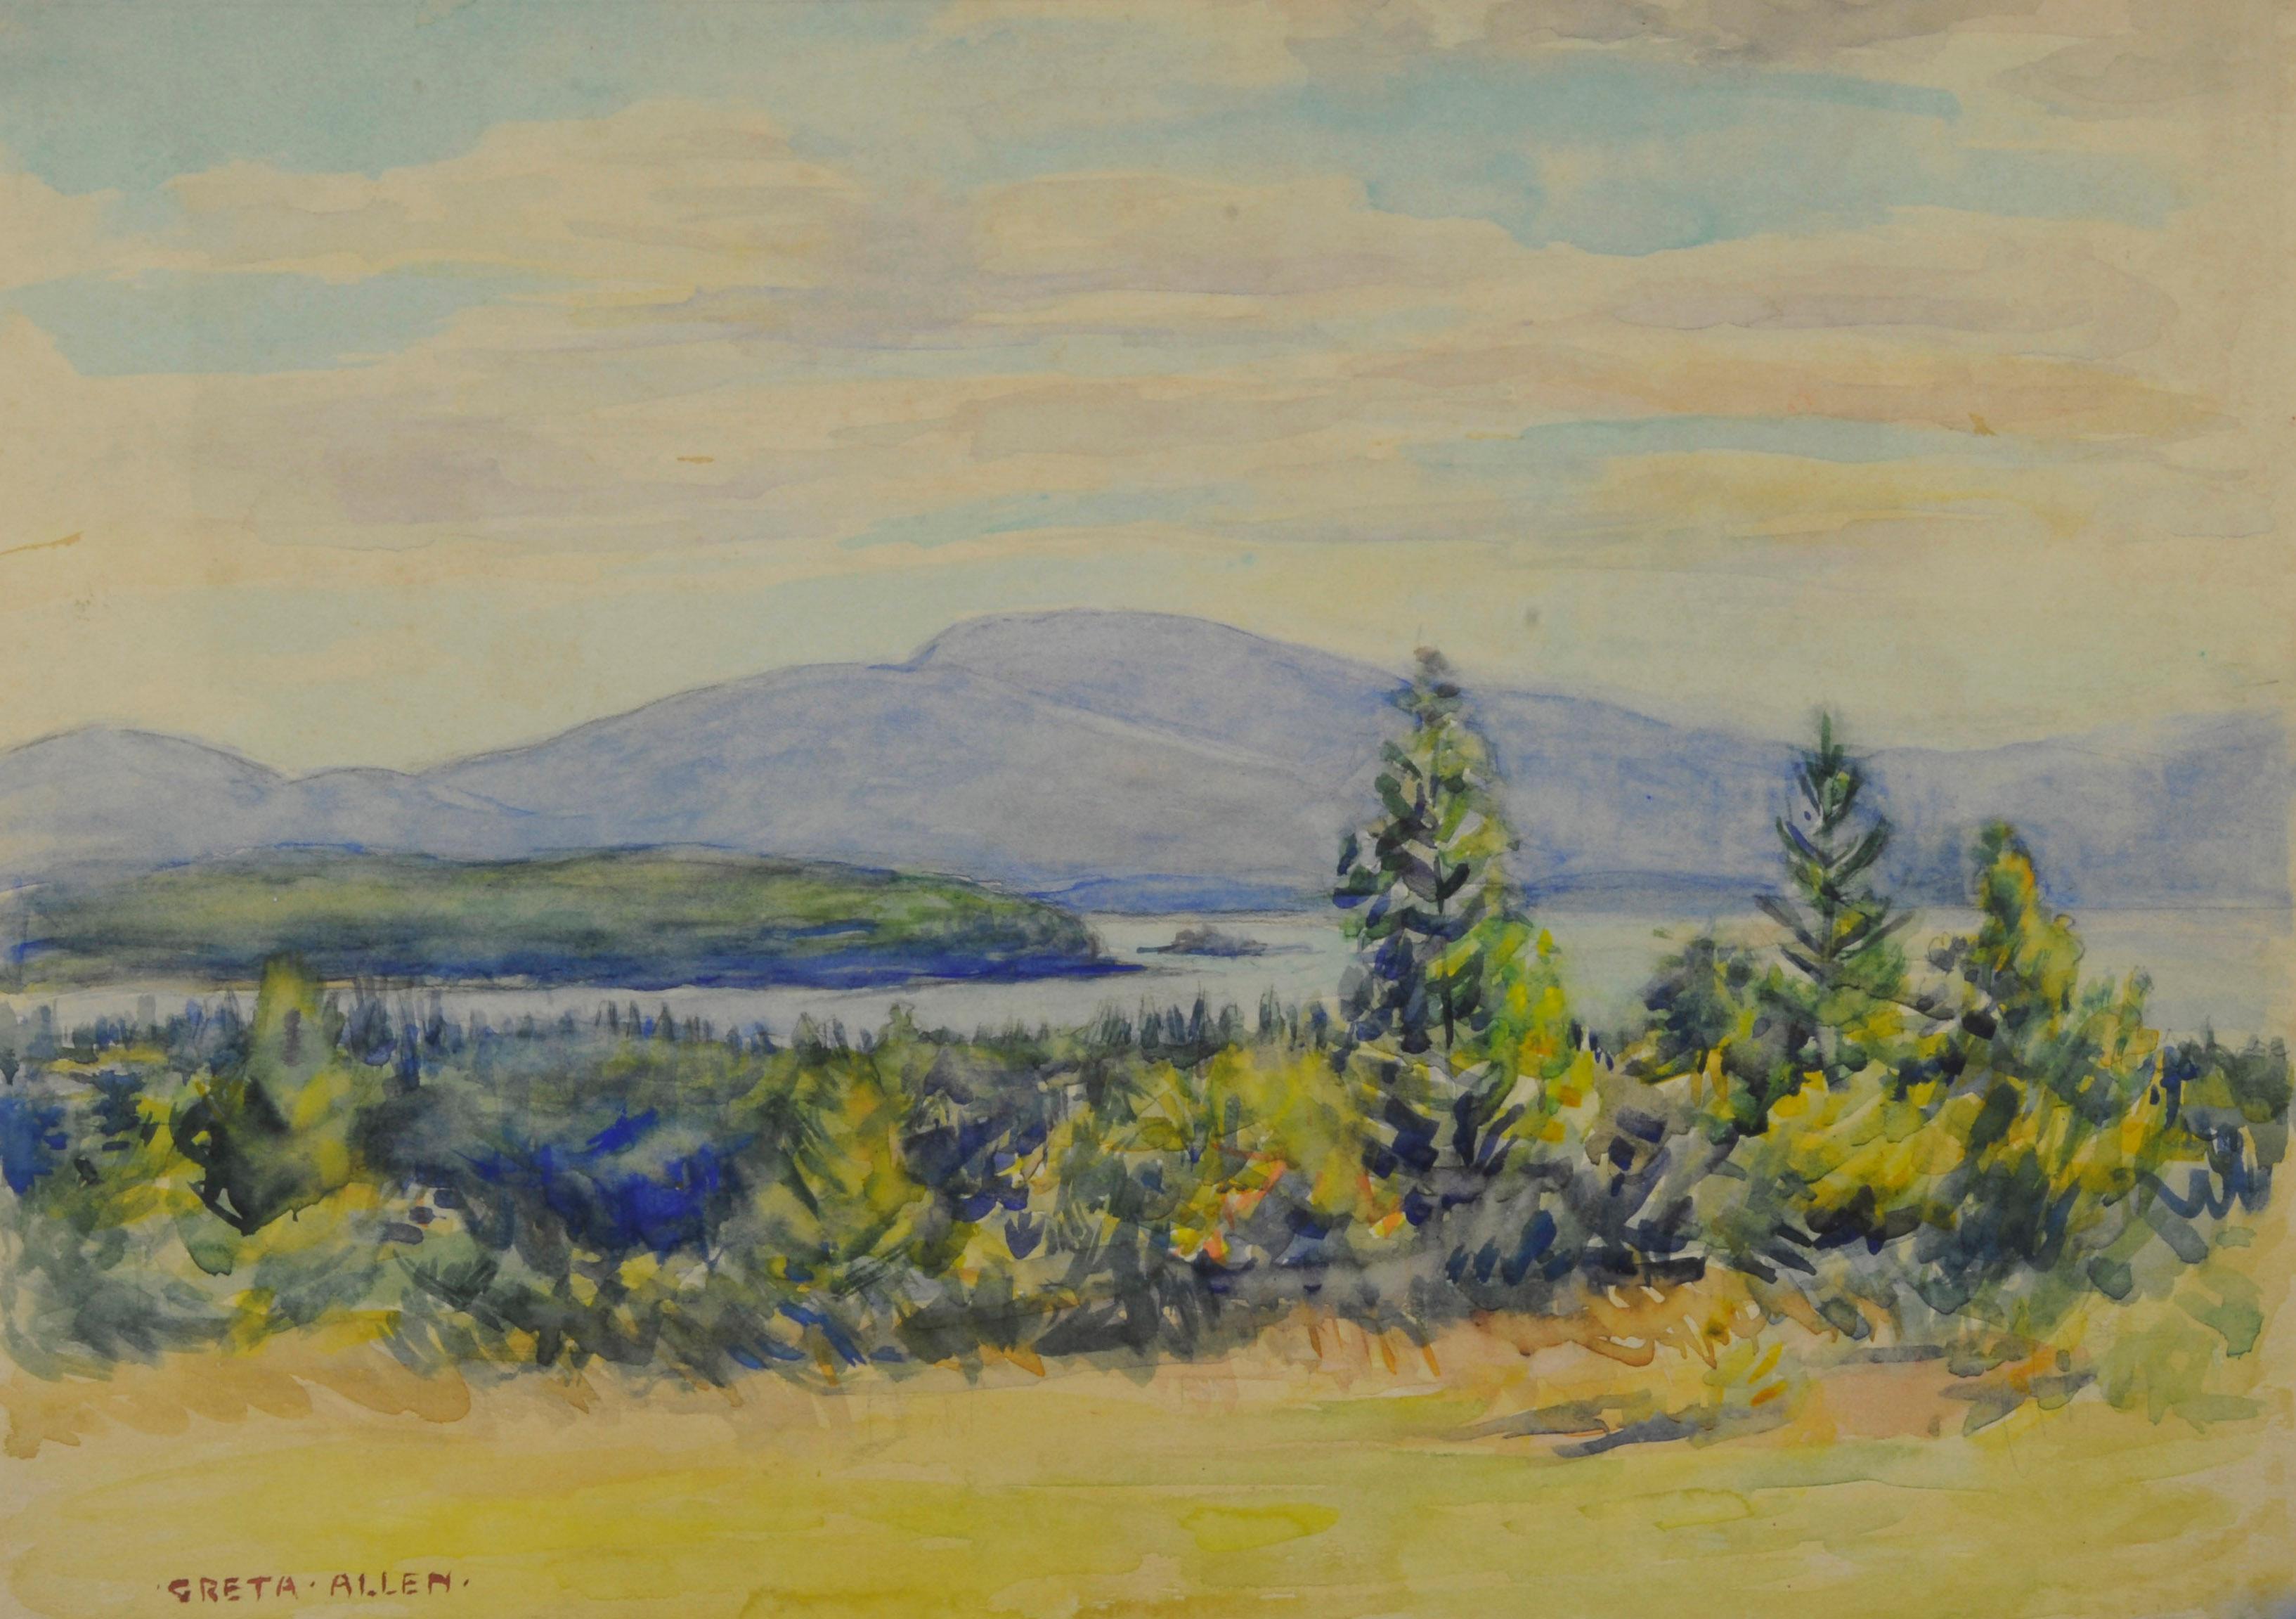 untitled (Maine Landscape near Mt. Desert Island)